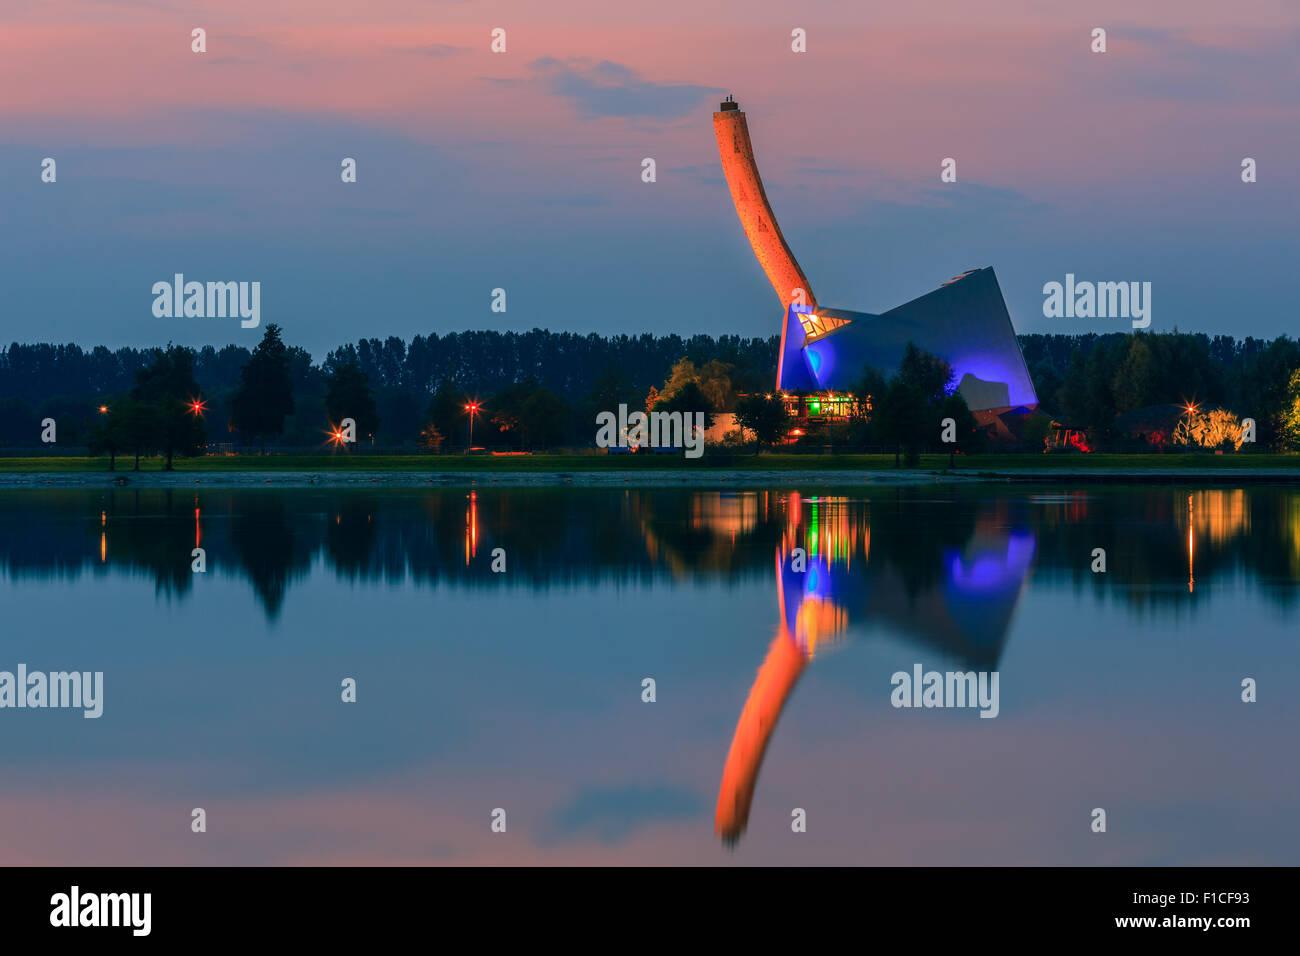 Climbing Center Bjoeks is located at sportpark Kardinge in The Netherlands. - Stock Image